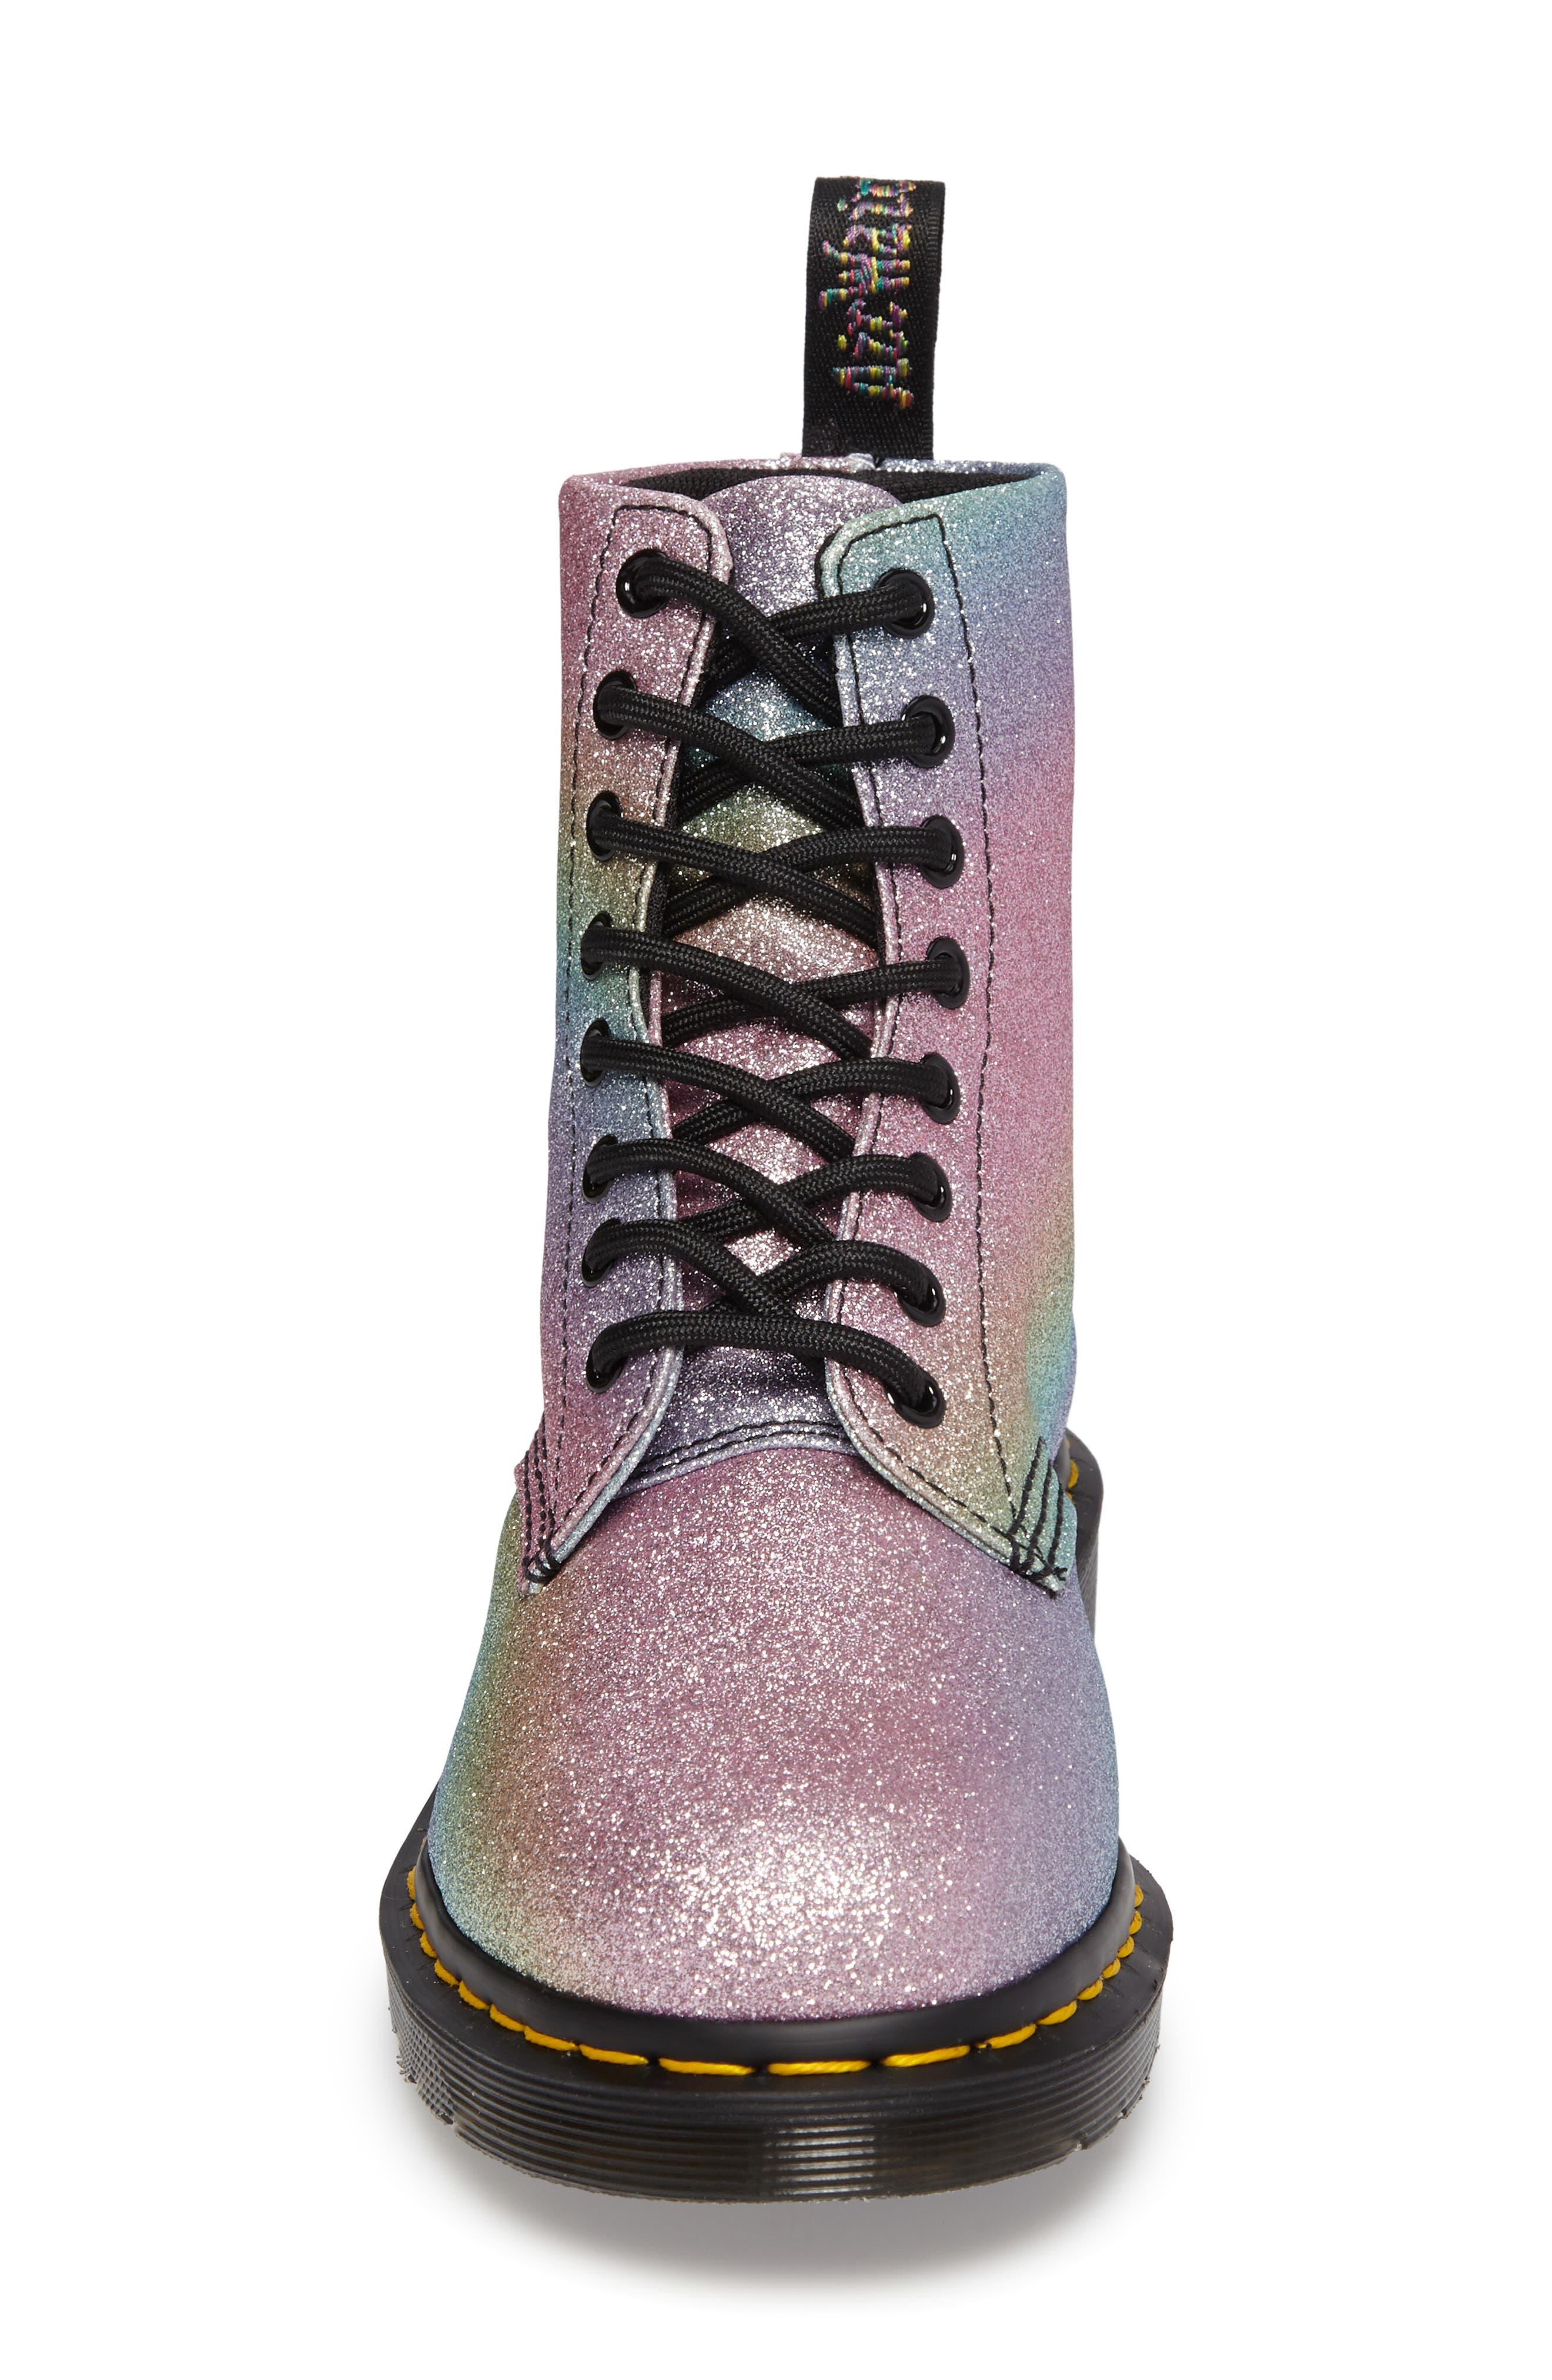 Pascal Glitter Boot,                             Alternate thumbnail 4, color,                             MULTI GLITTER